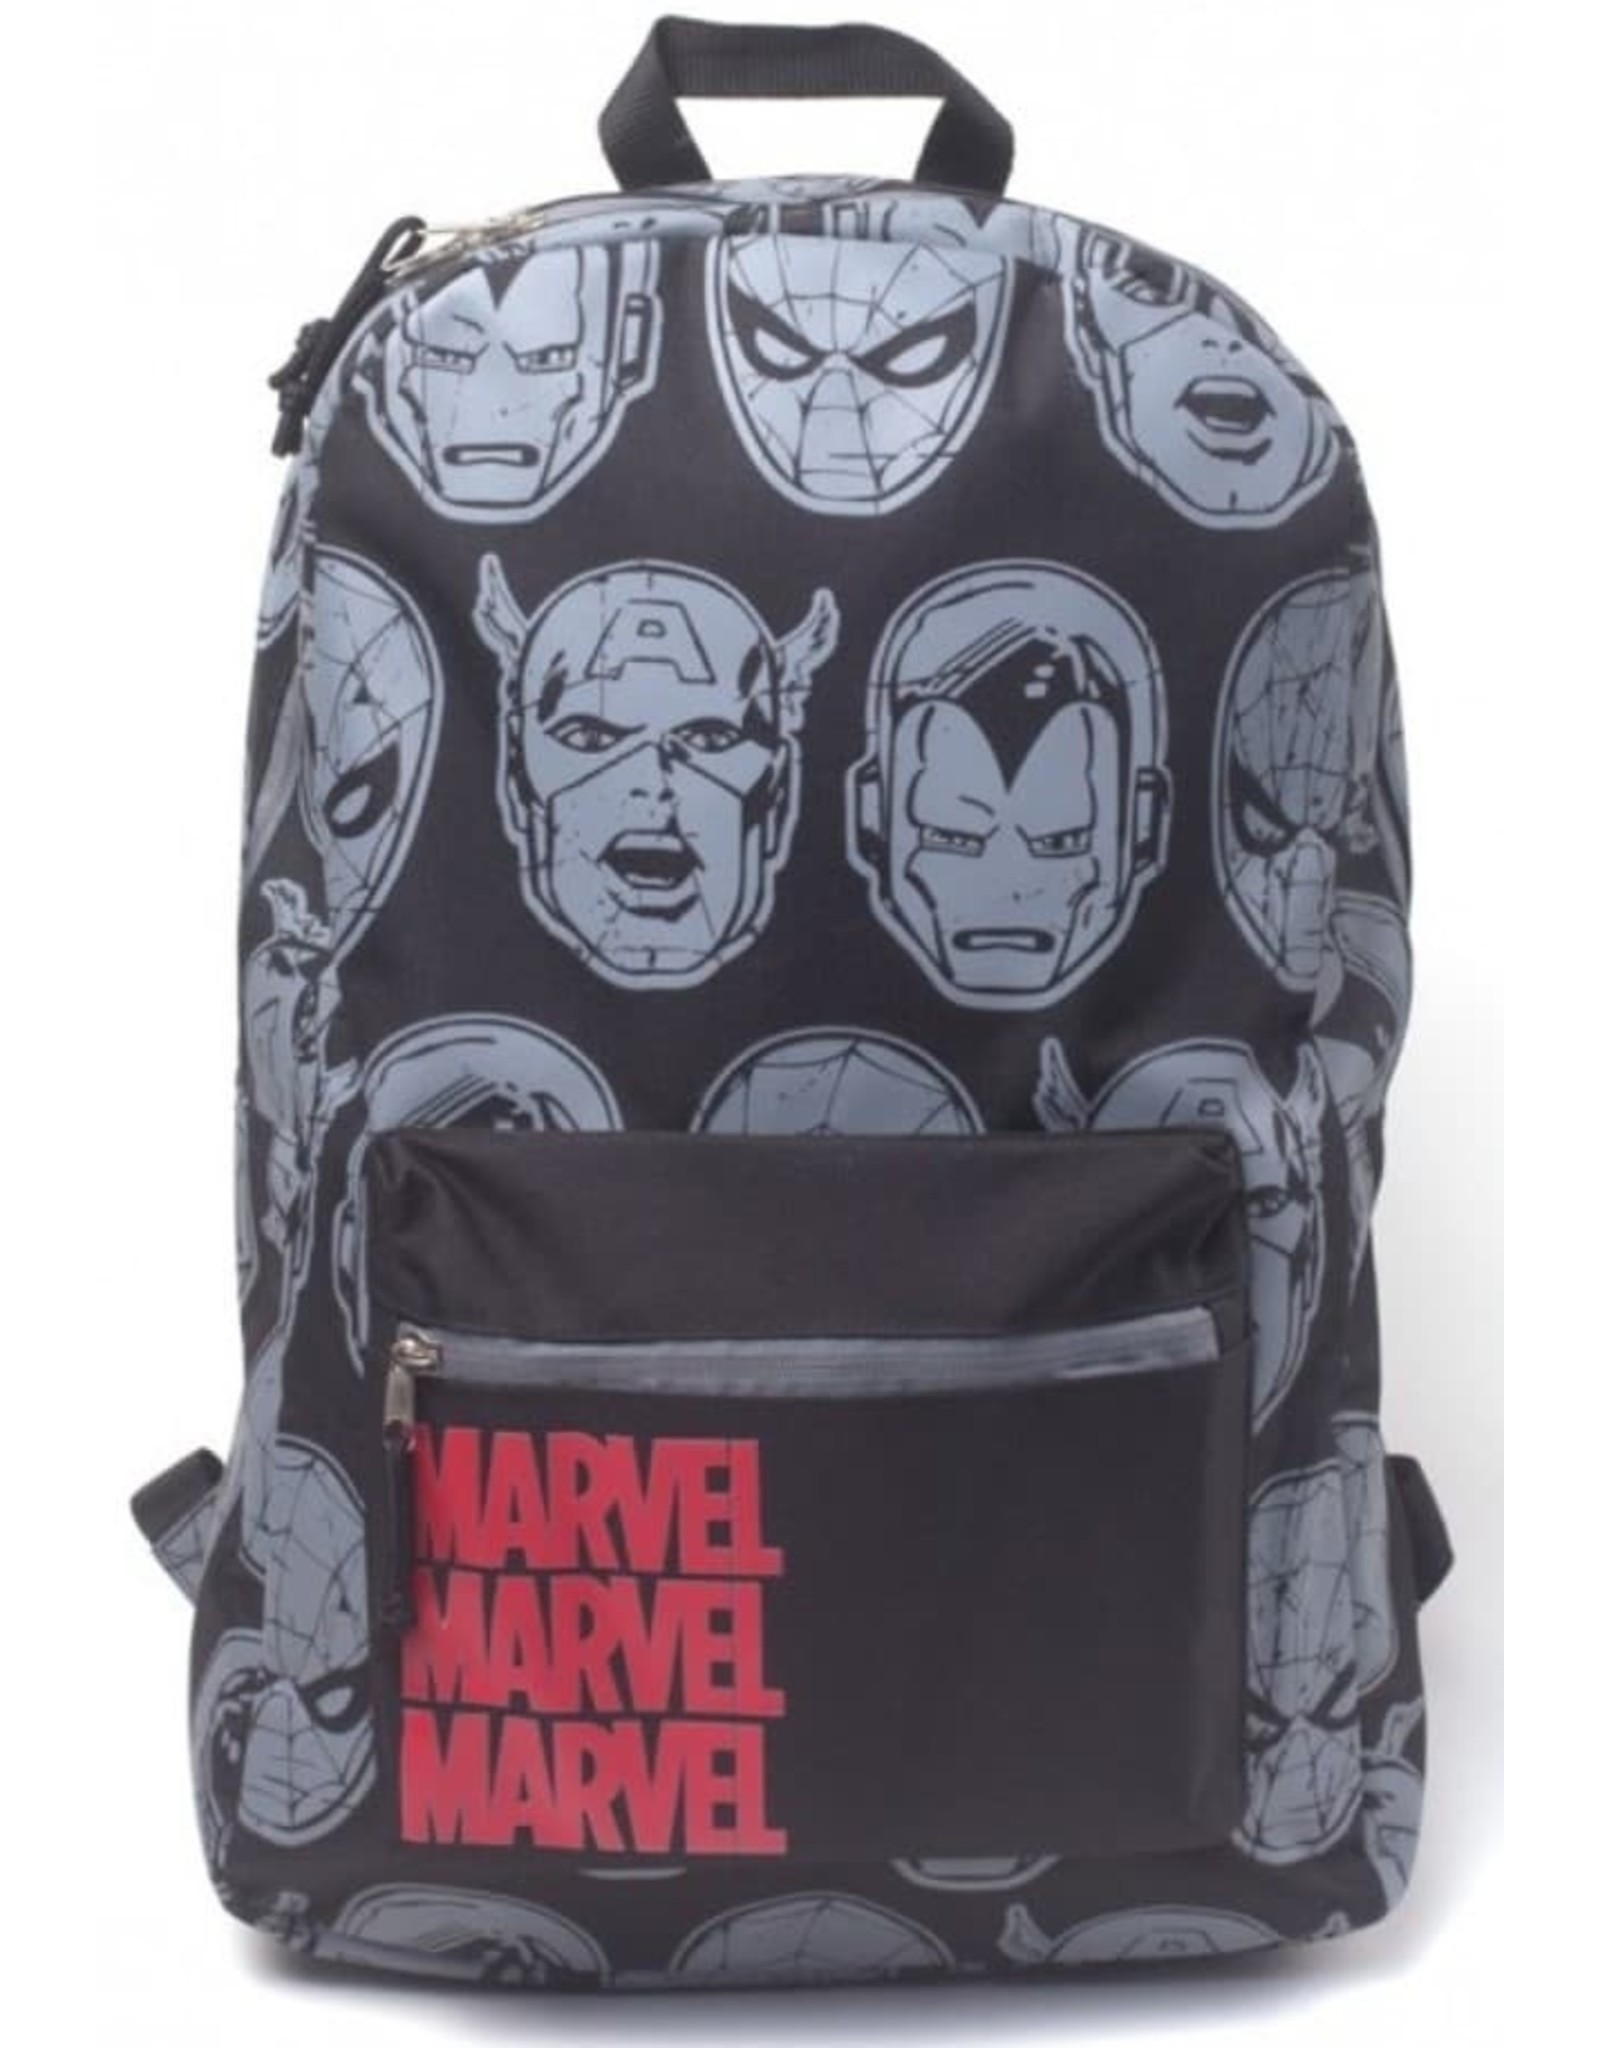 Marvel Marvel tassen - Marvel Characters All Over printed rugzak